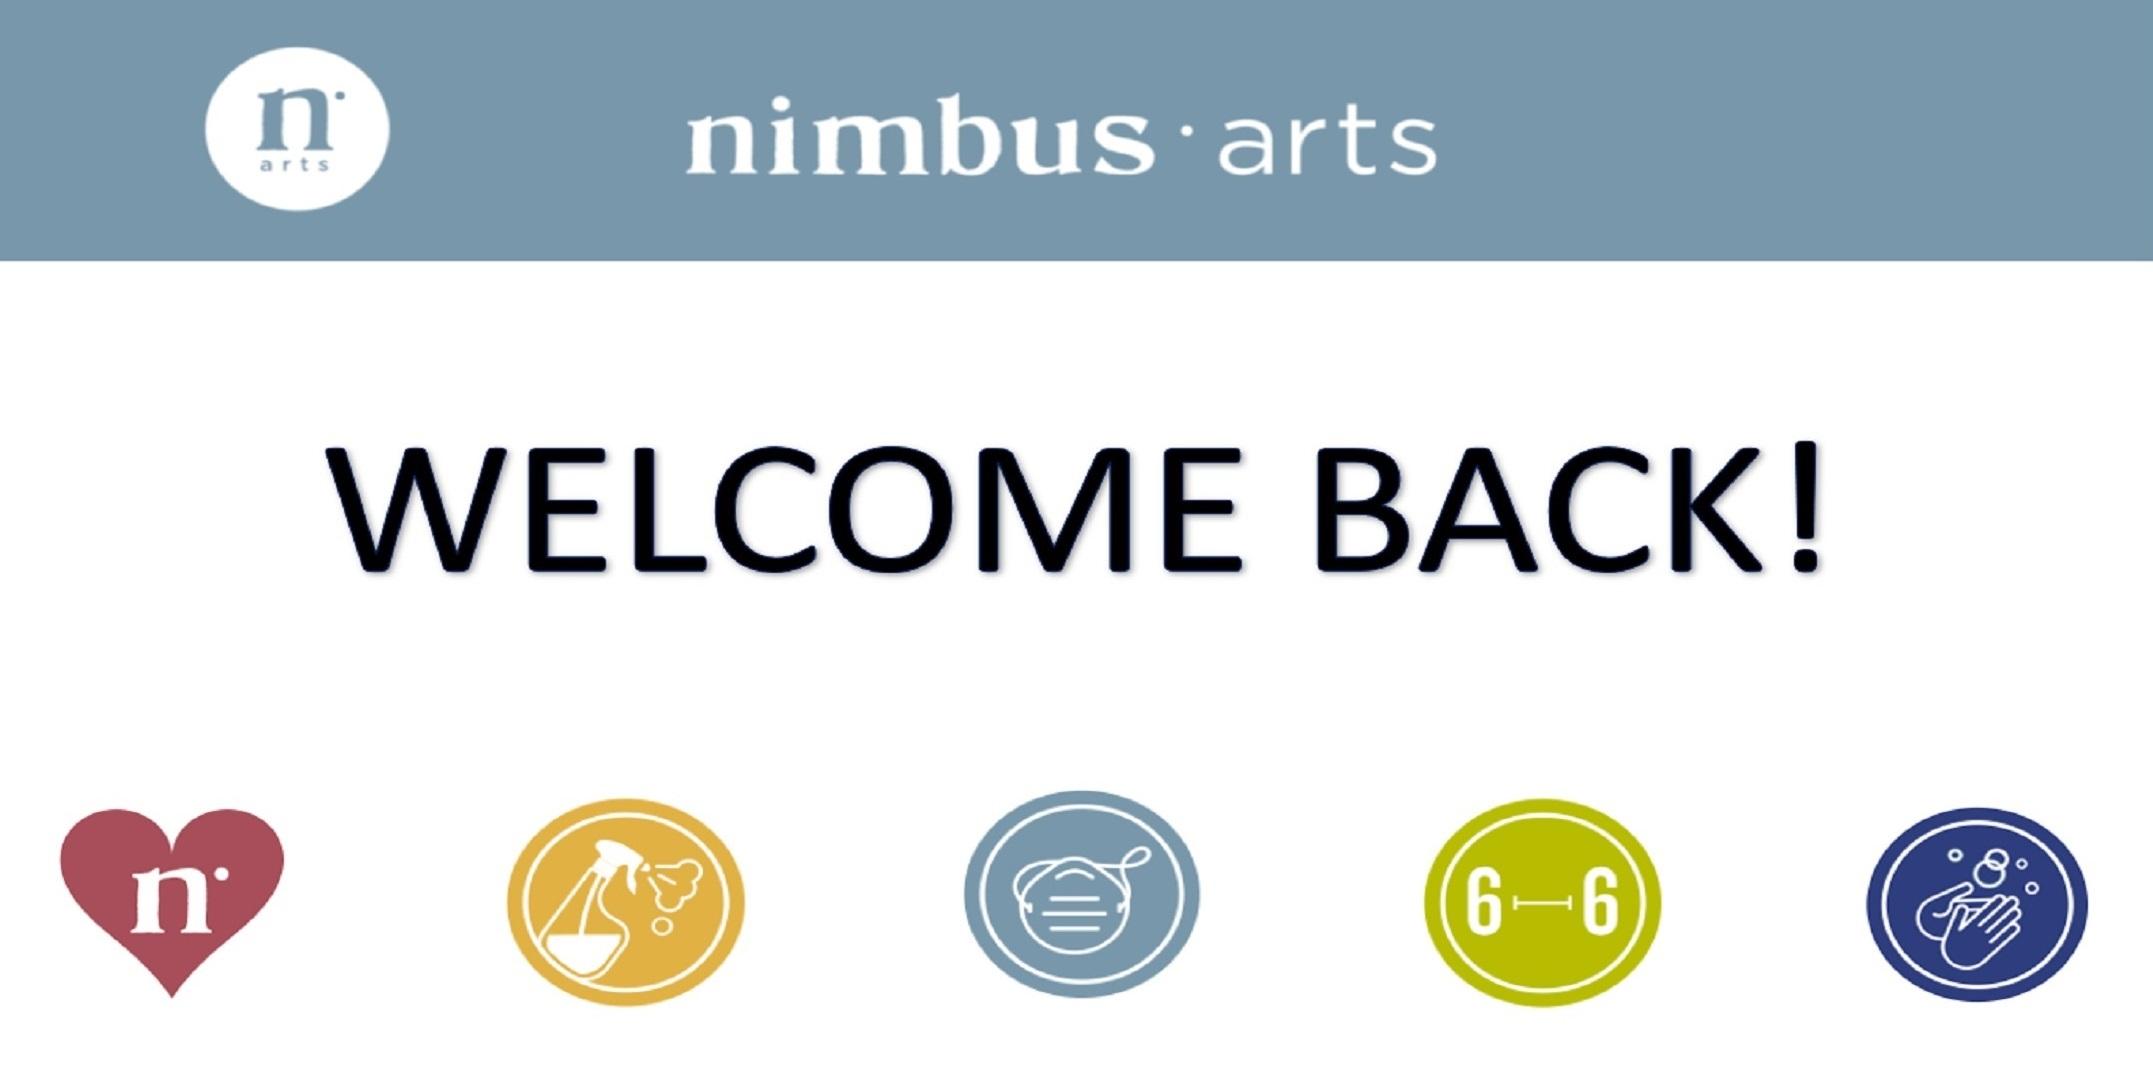 Nimbus Arts Welcomes You Back!